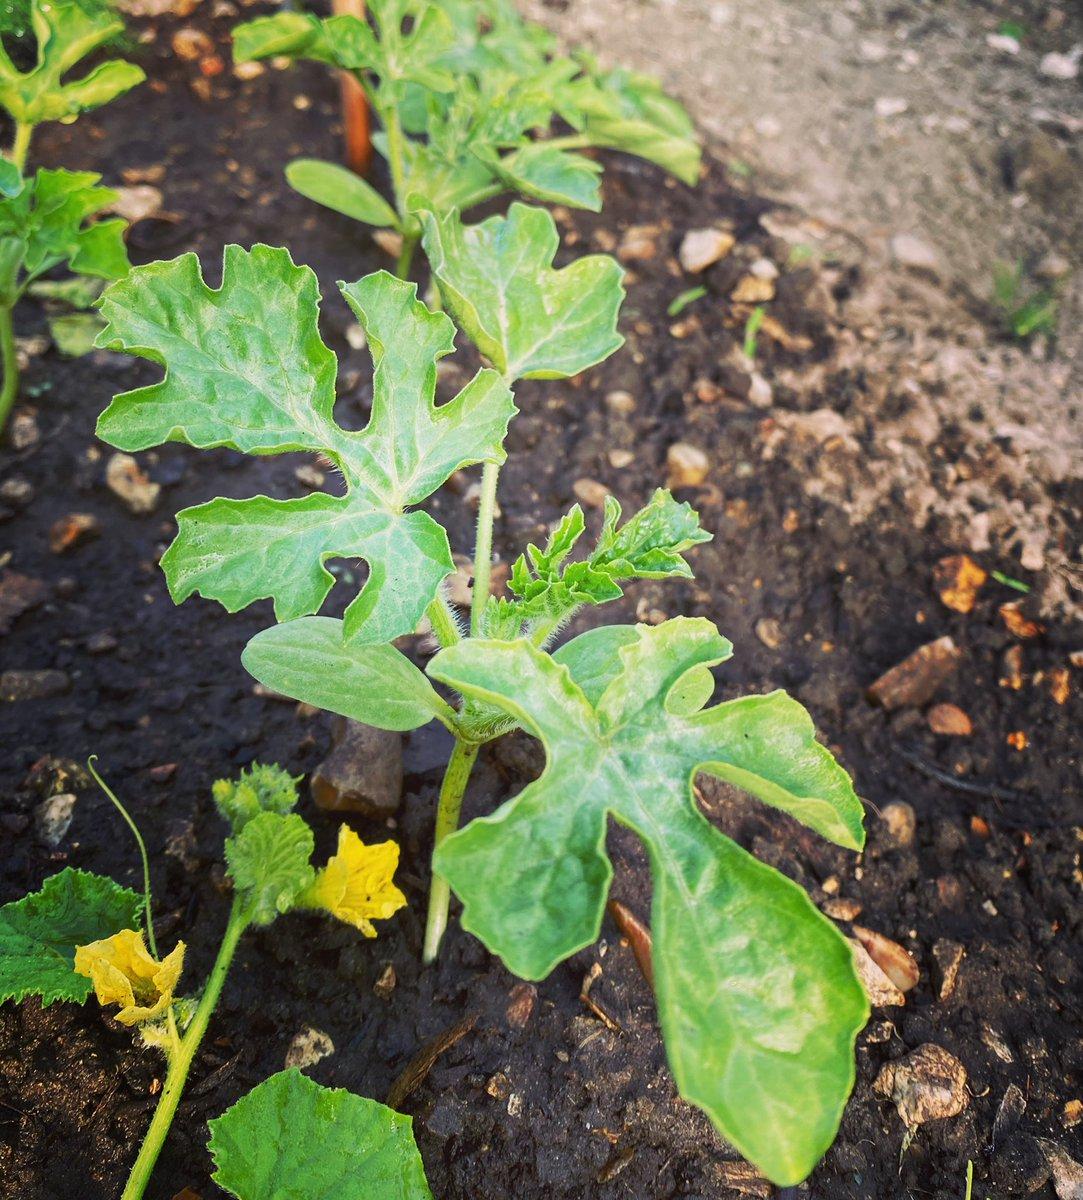 Water melon plants doing ok so far 🤞😊 #allotmentlife  #friday #growyourown  #plants https://t.co/OMfOTysyQ1